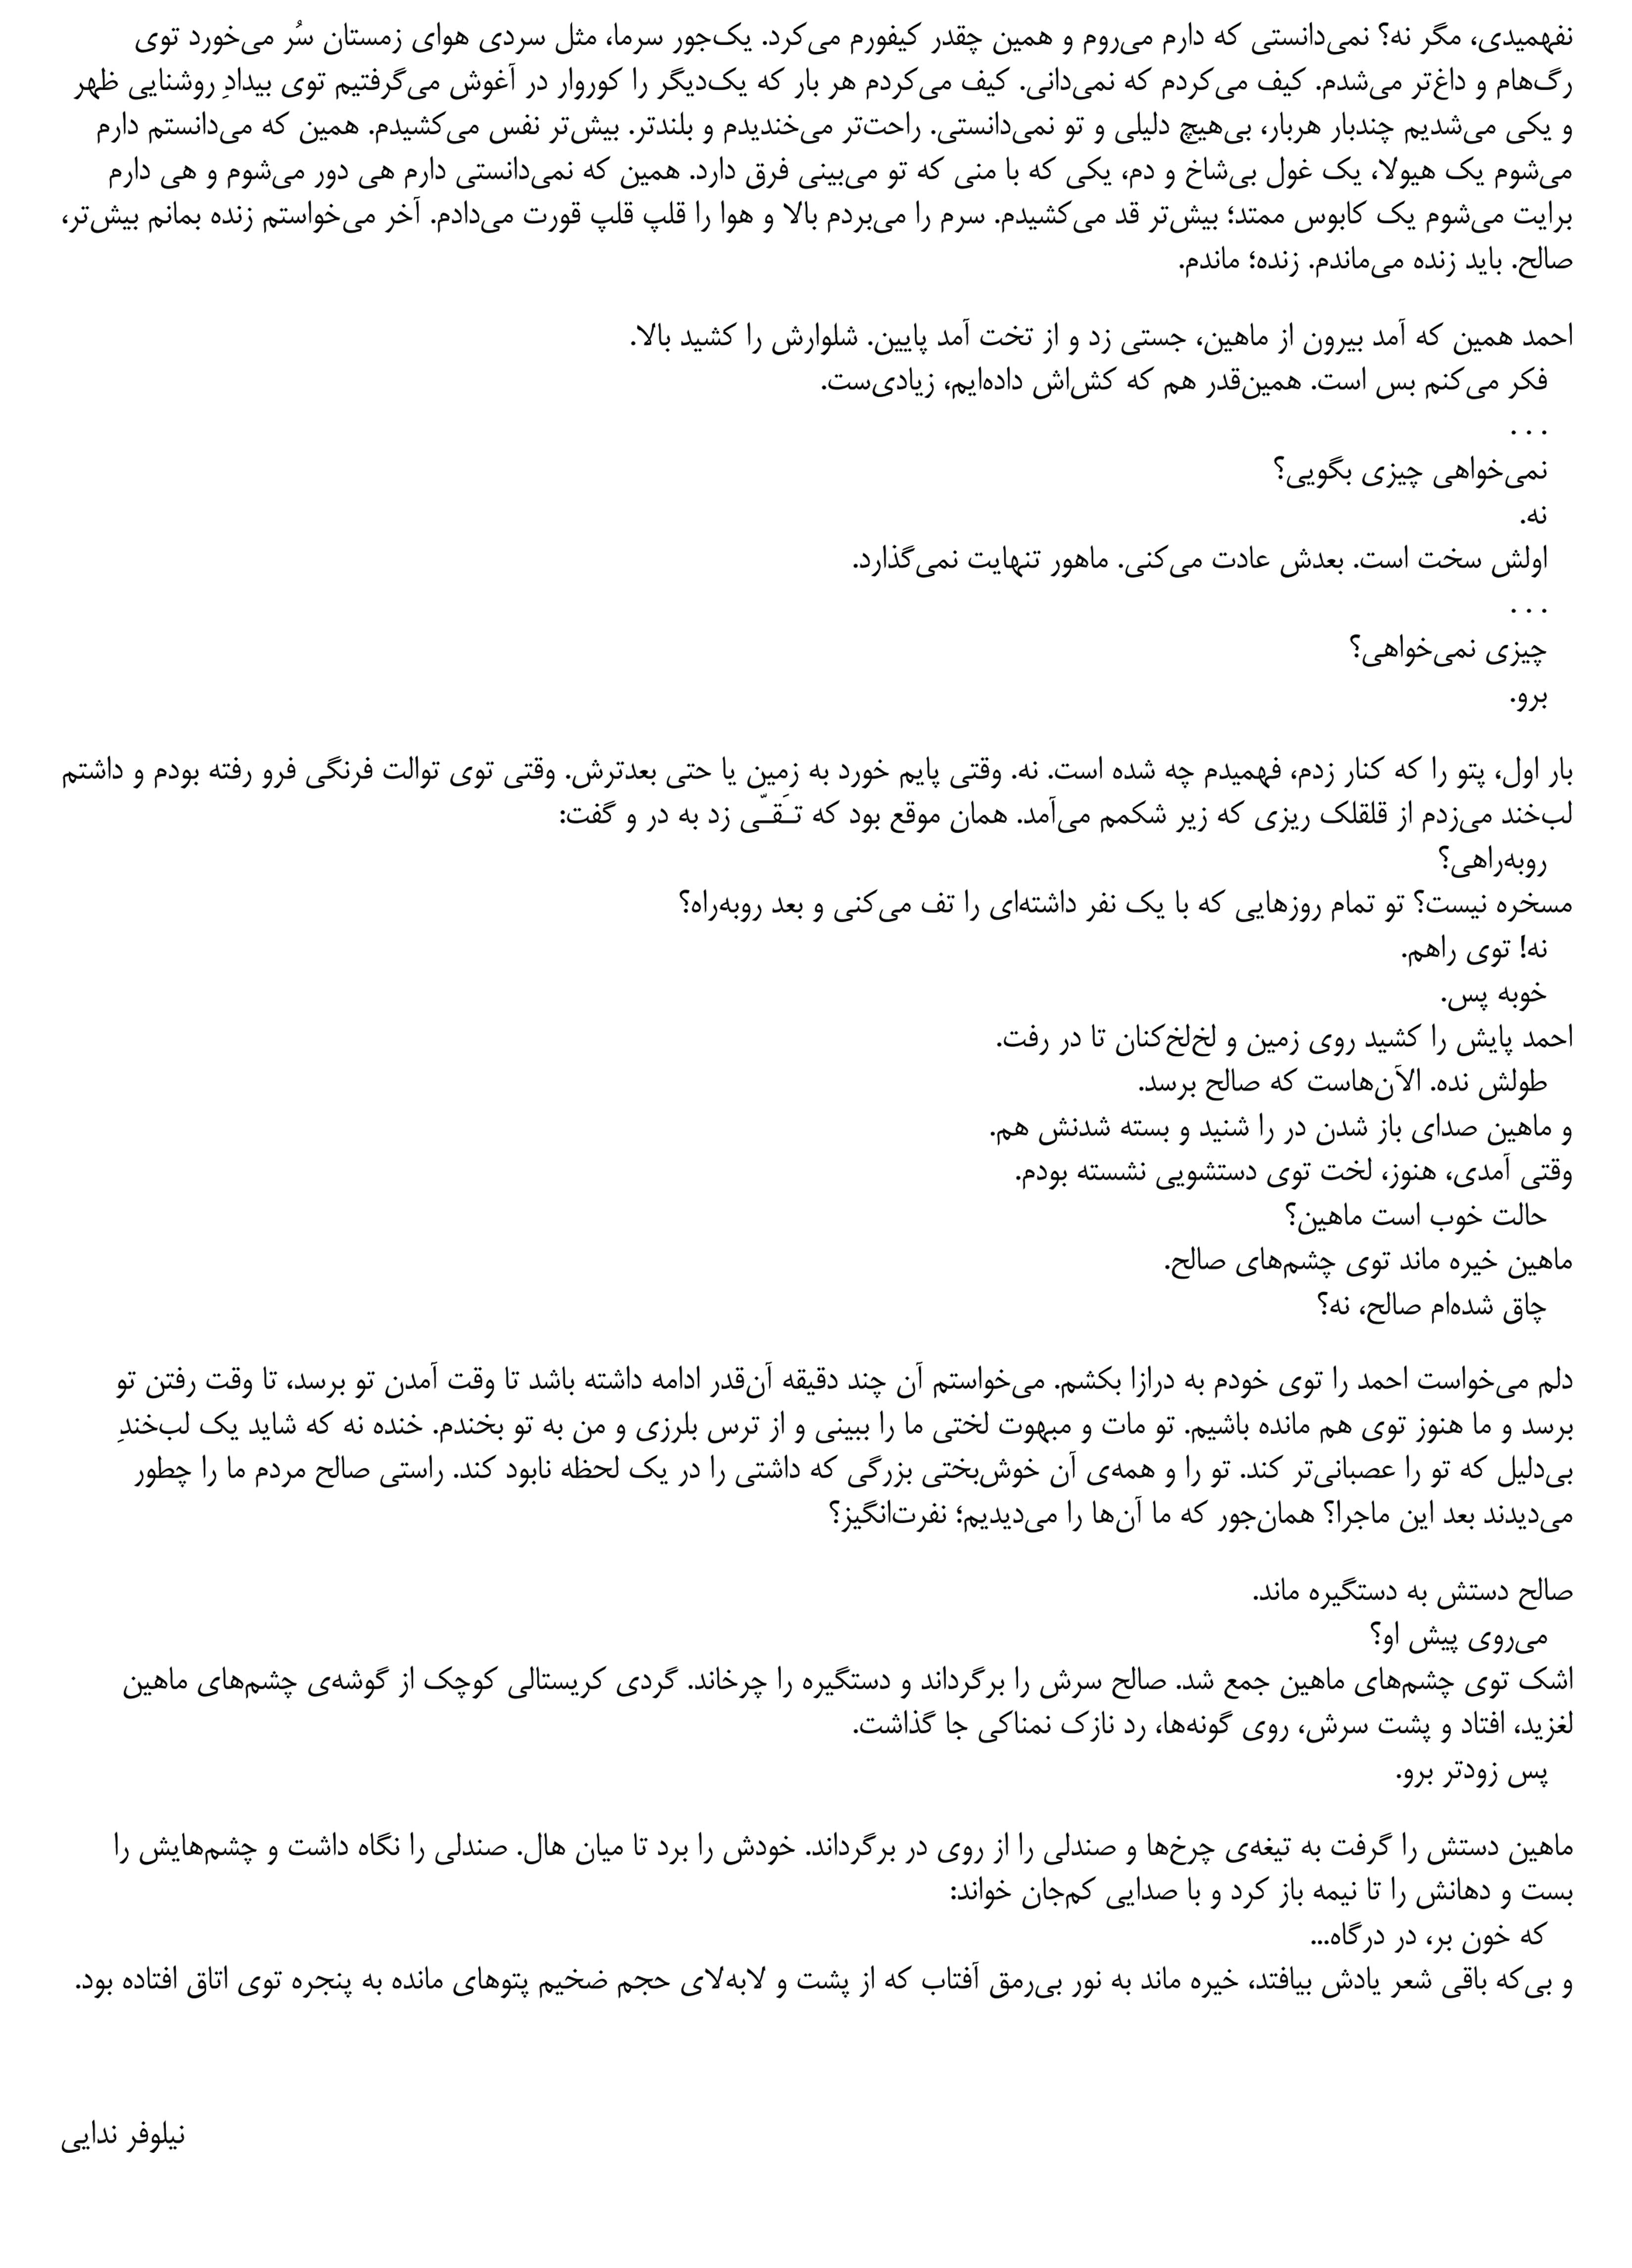 Microsoft Word - -.docx